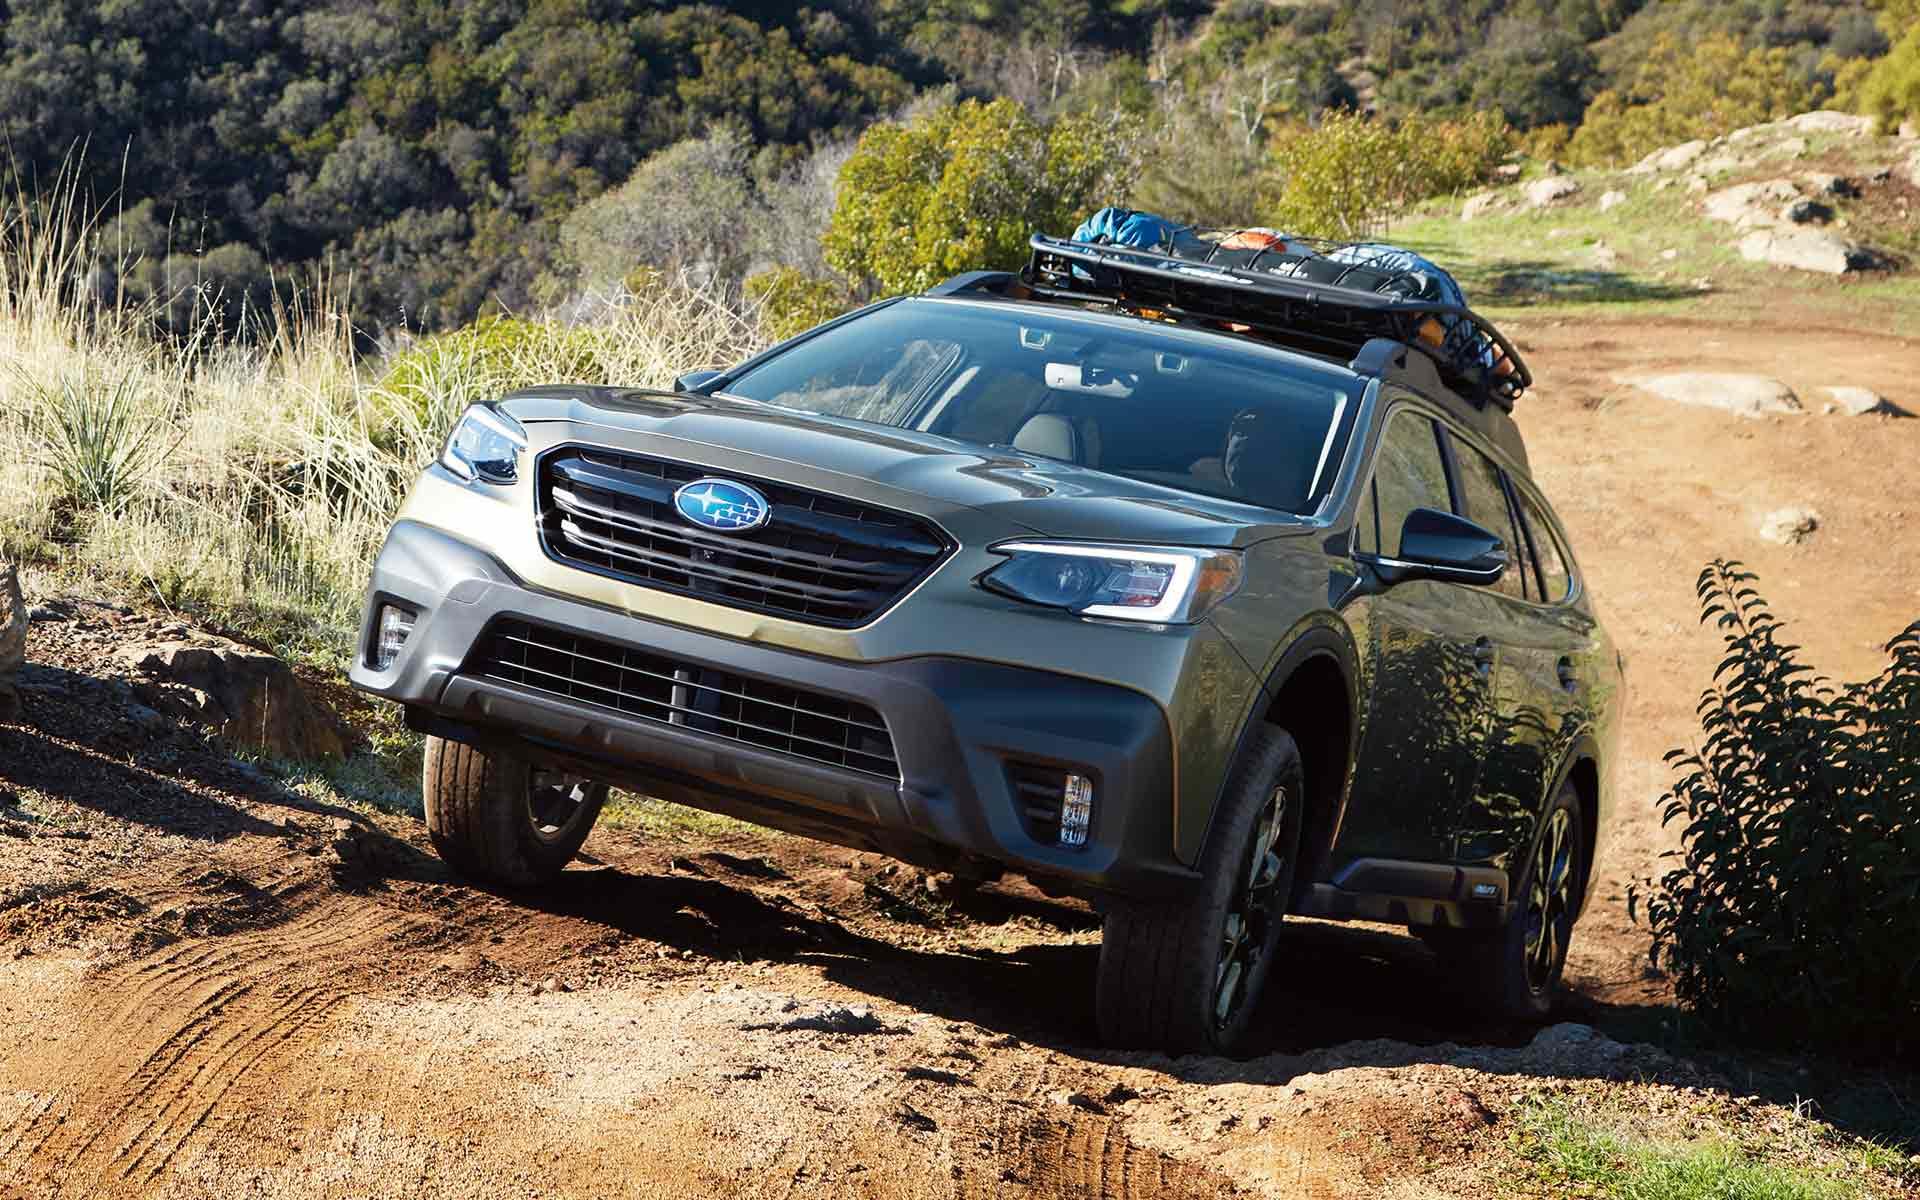 25 New Subaru Vision 2020 Images for Subaru Vision 2020